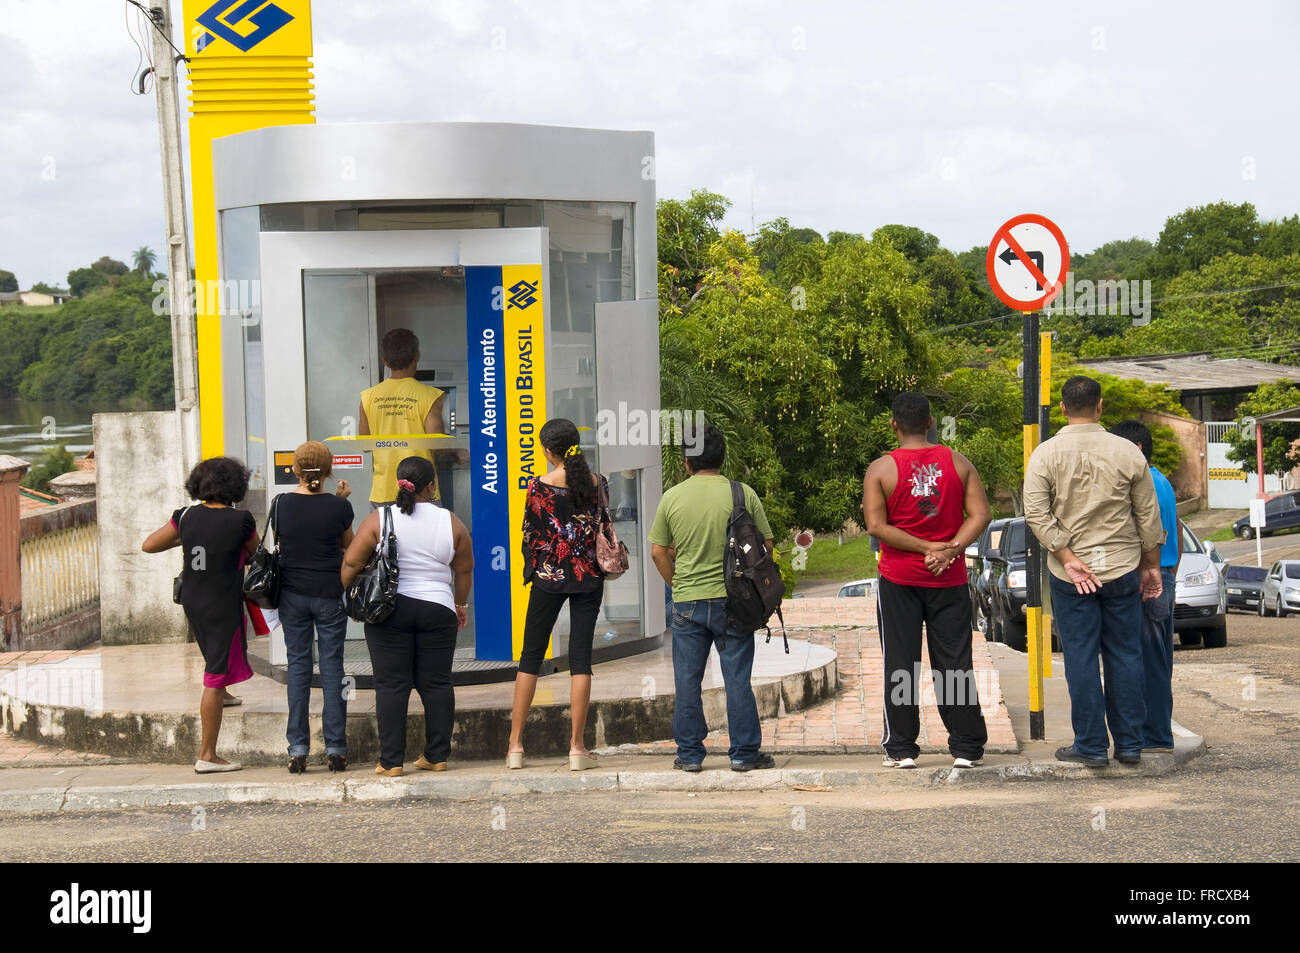 Queue for ATM in Boa Vista - Stock Image